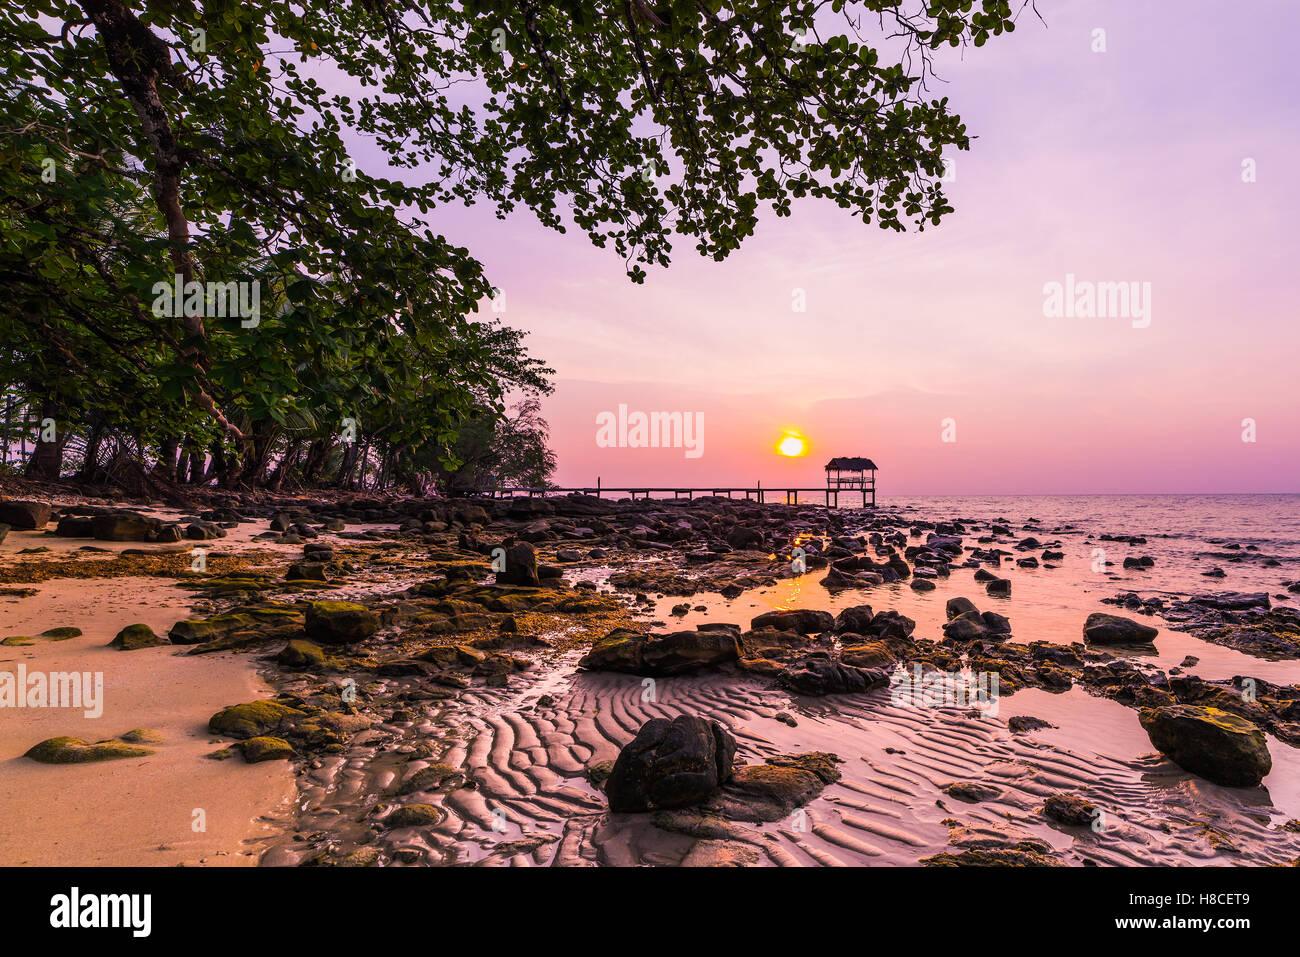 Sunset over the beach, island Koh Kood, Thailand. - Stock Image